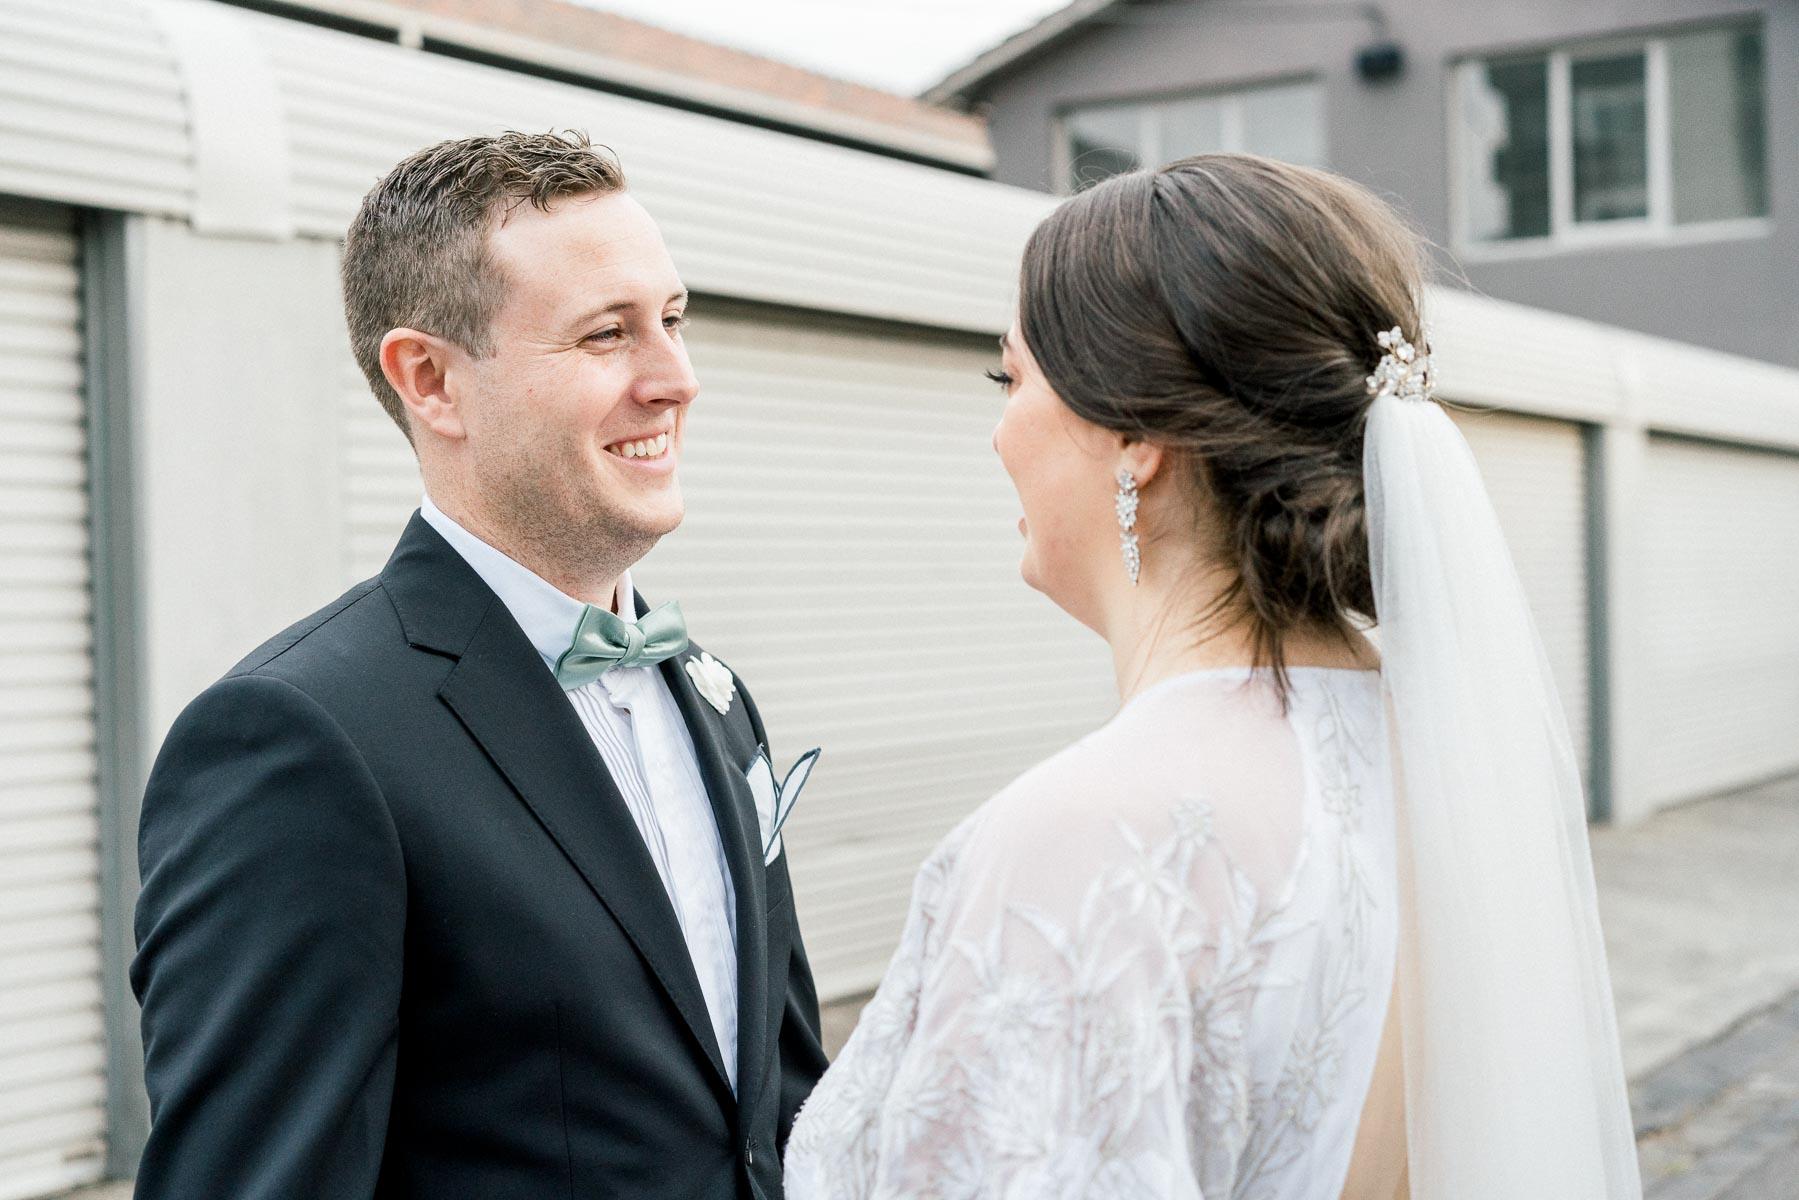 little-henri-cafe-wedding-thornbury-heart+soul-weddings-jane-aaron-05848.jpg